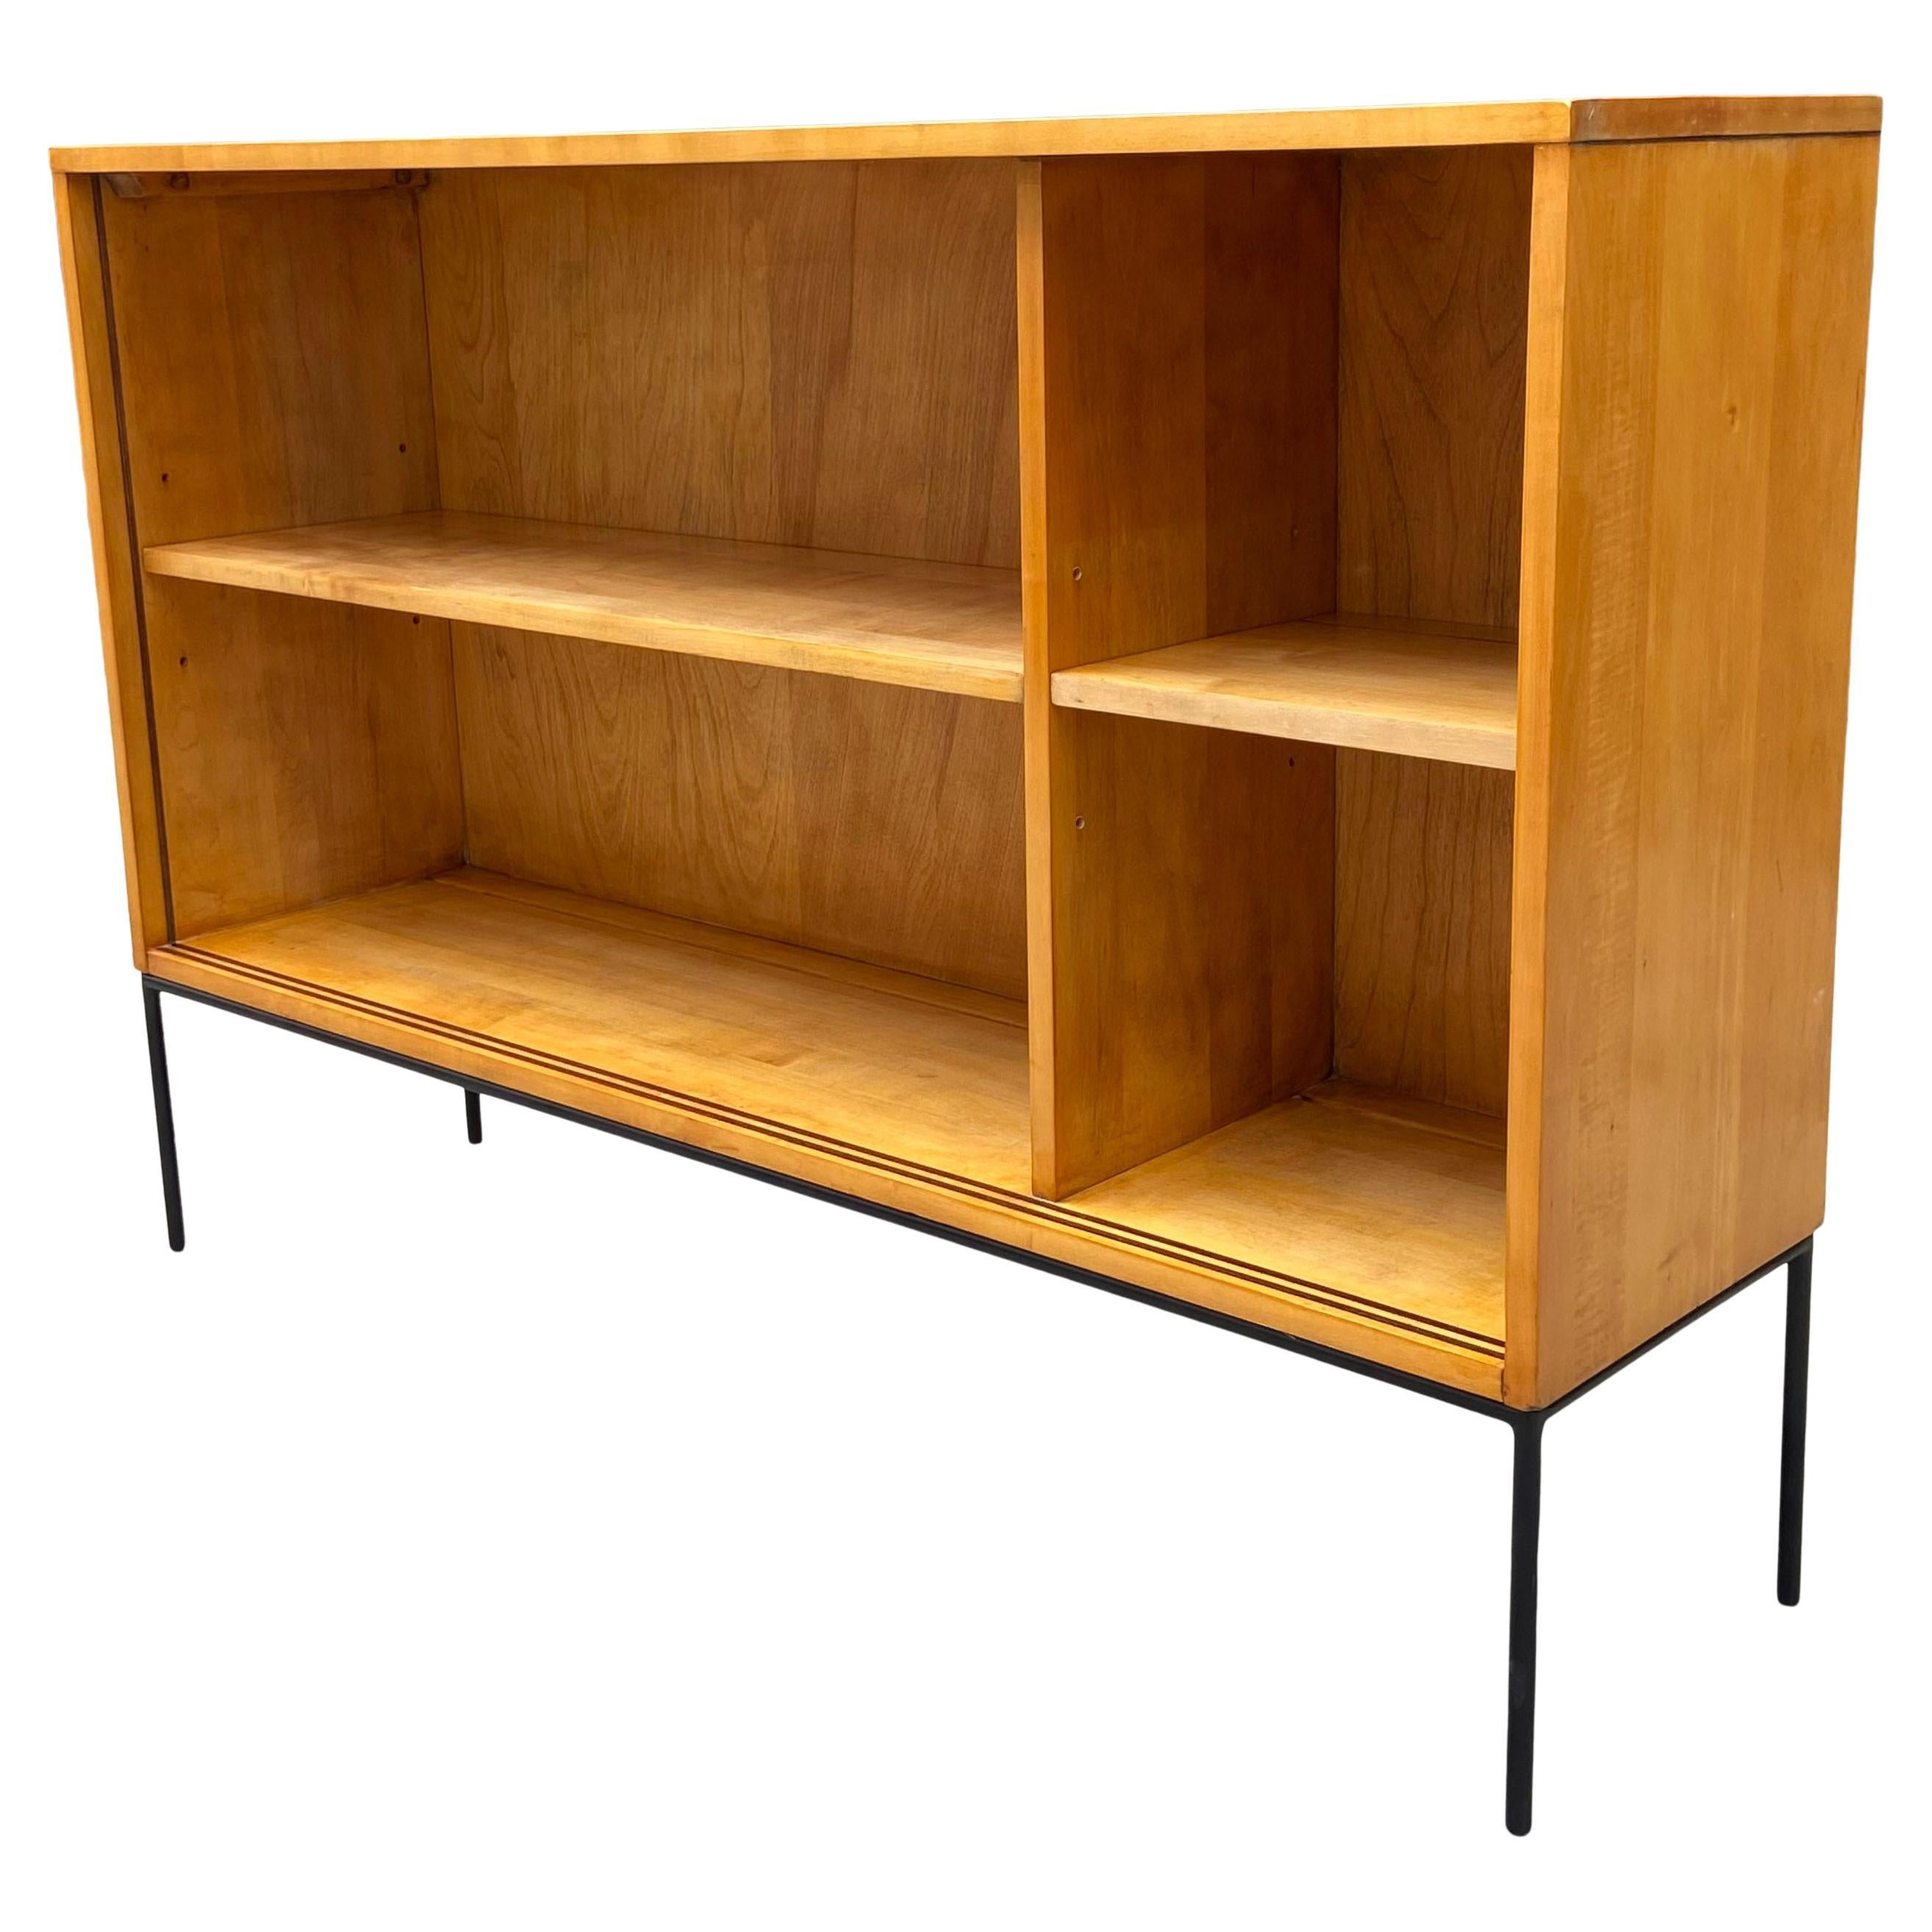 Midcentury Paul McCobb Single Bookshelf Maple on Iron Base